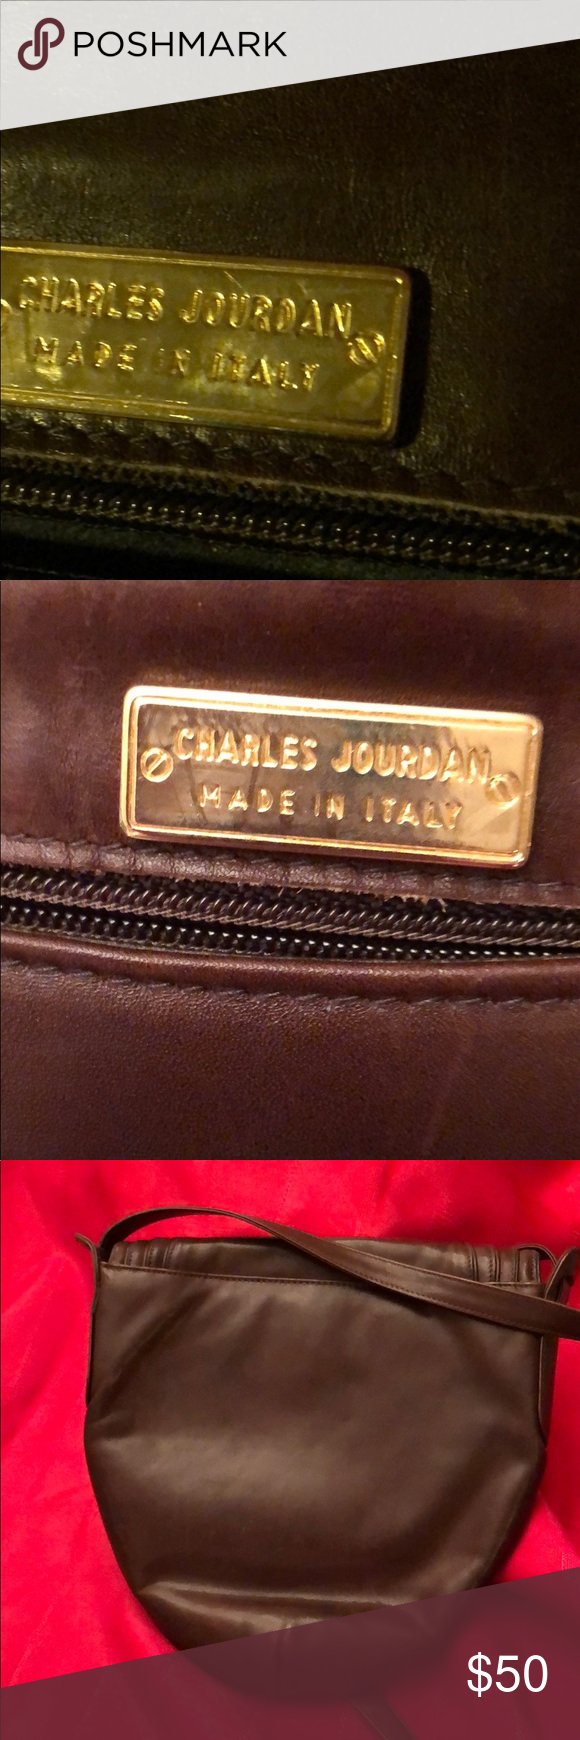 Charles Jourdan Leather Purse Leather Purses Charles Jourdan Purses